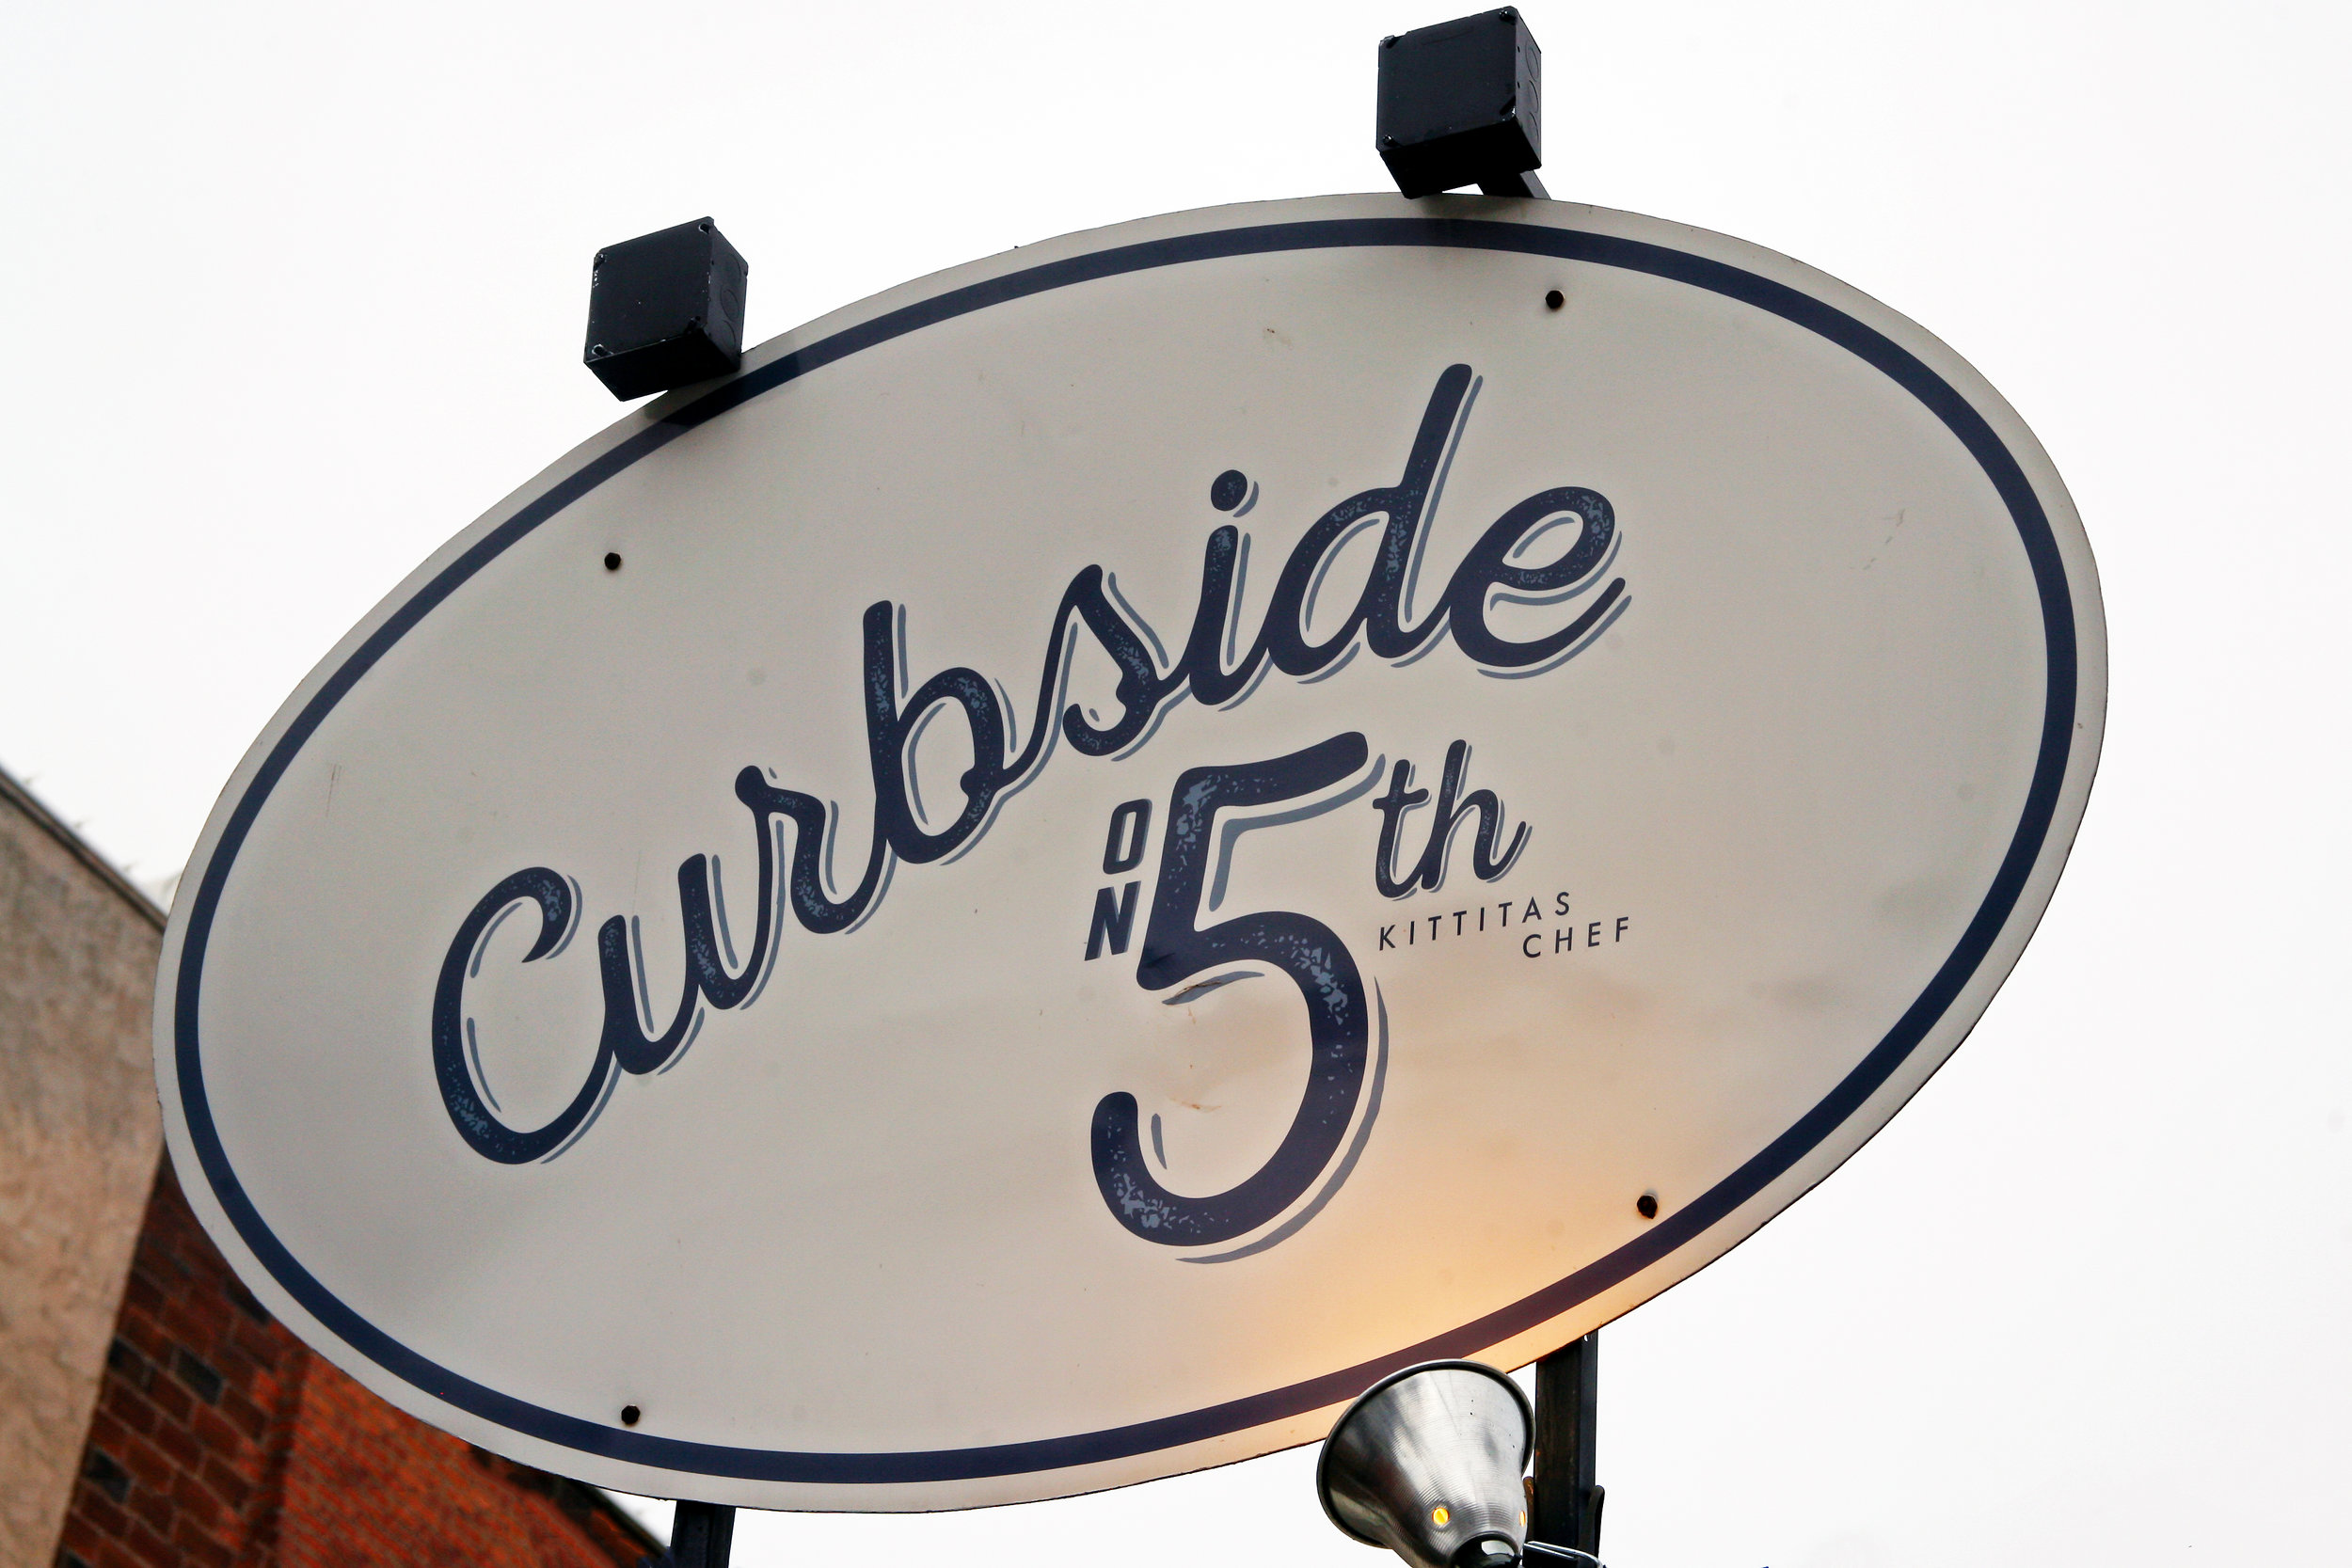 Curbside Sign.jpg